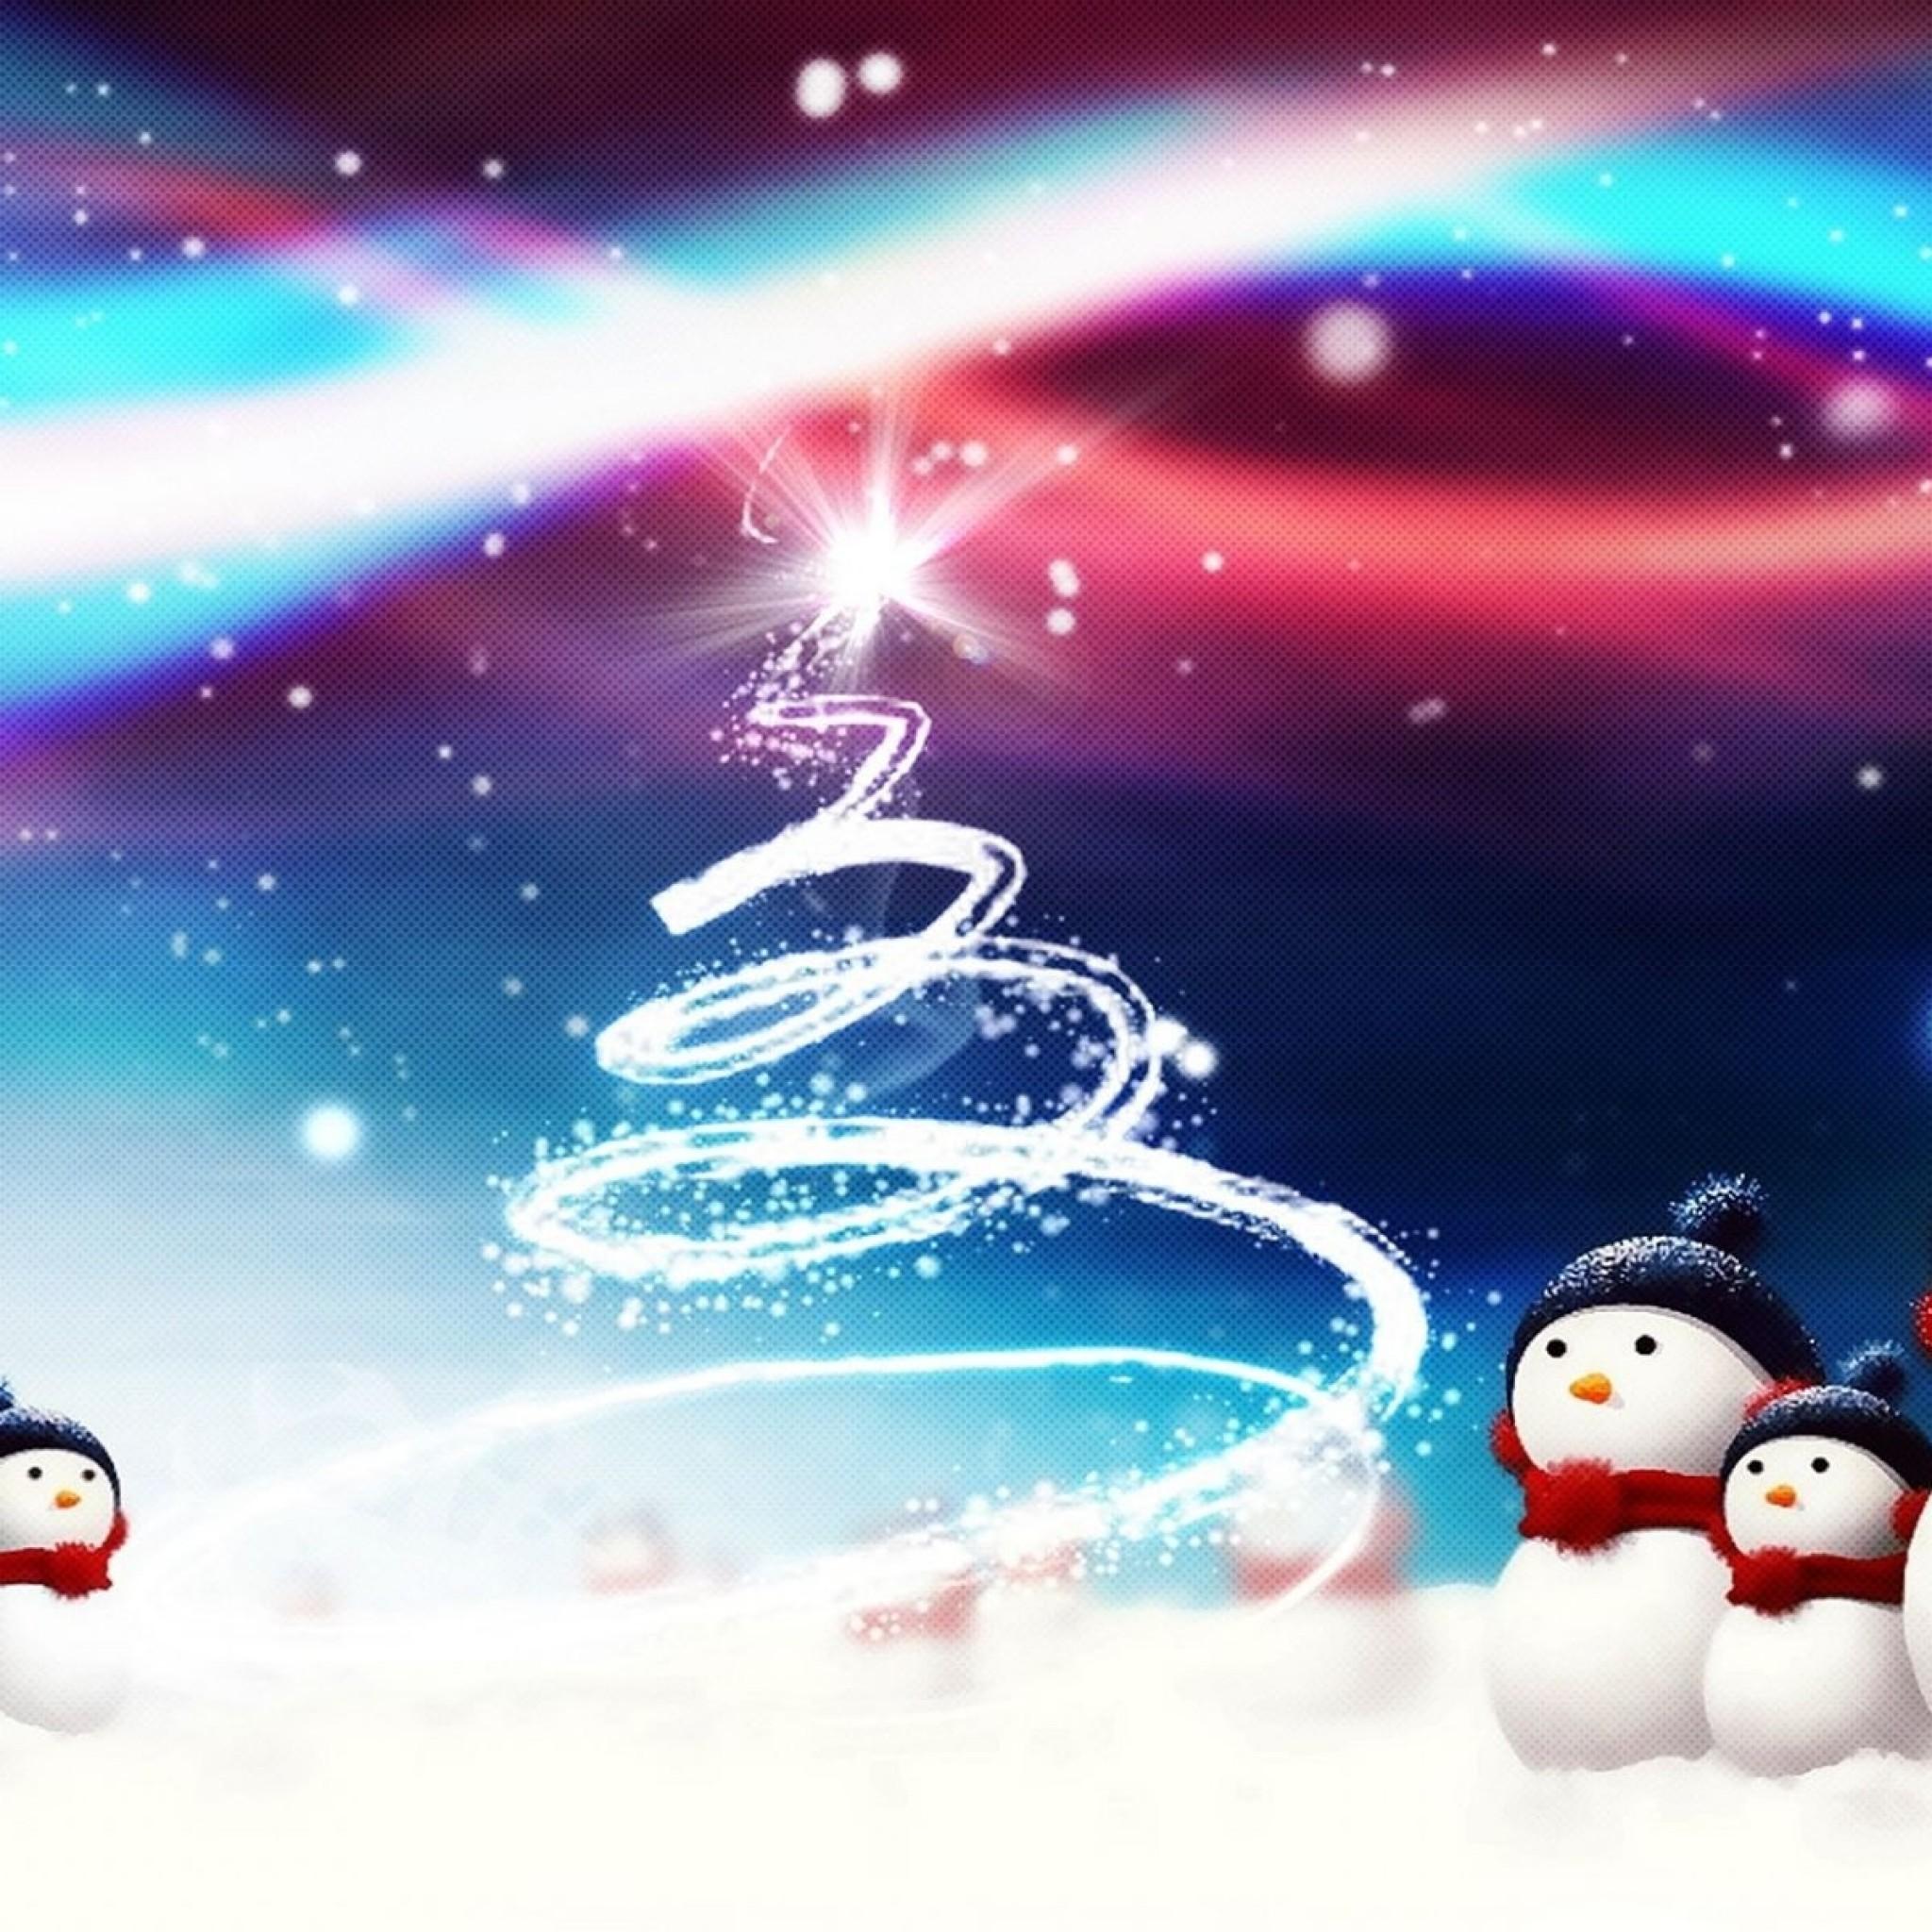 New IPad HD Christmas Wallpaper